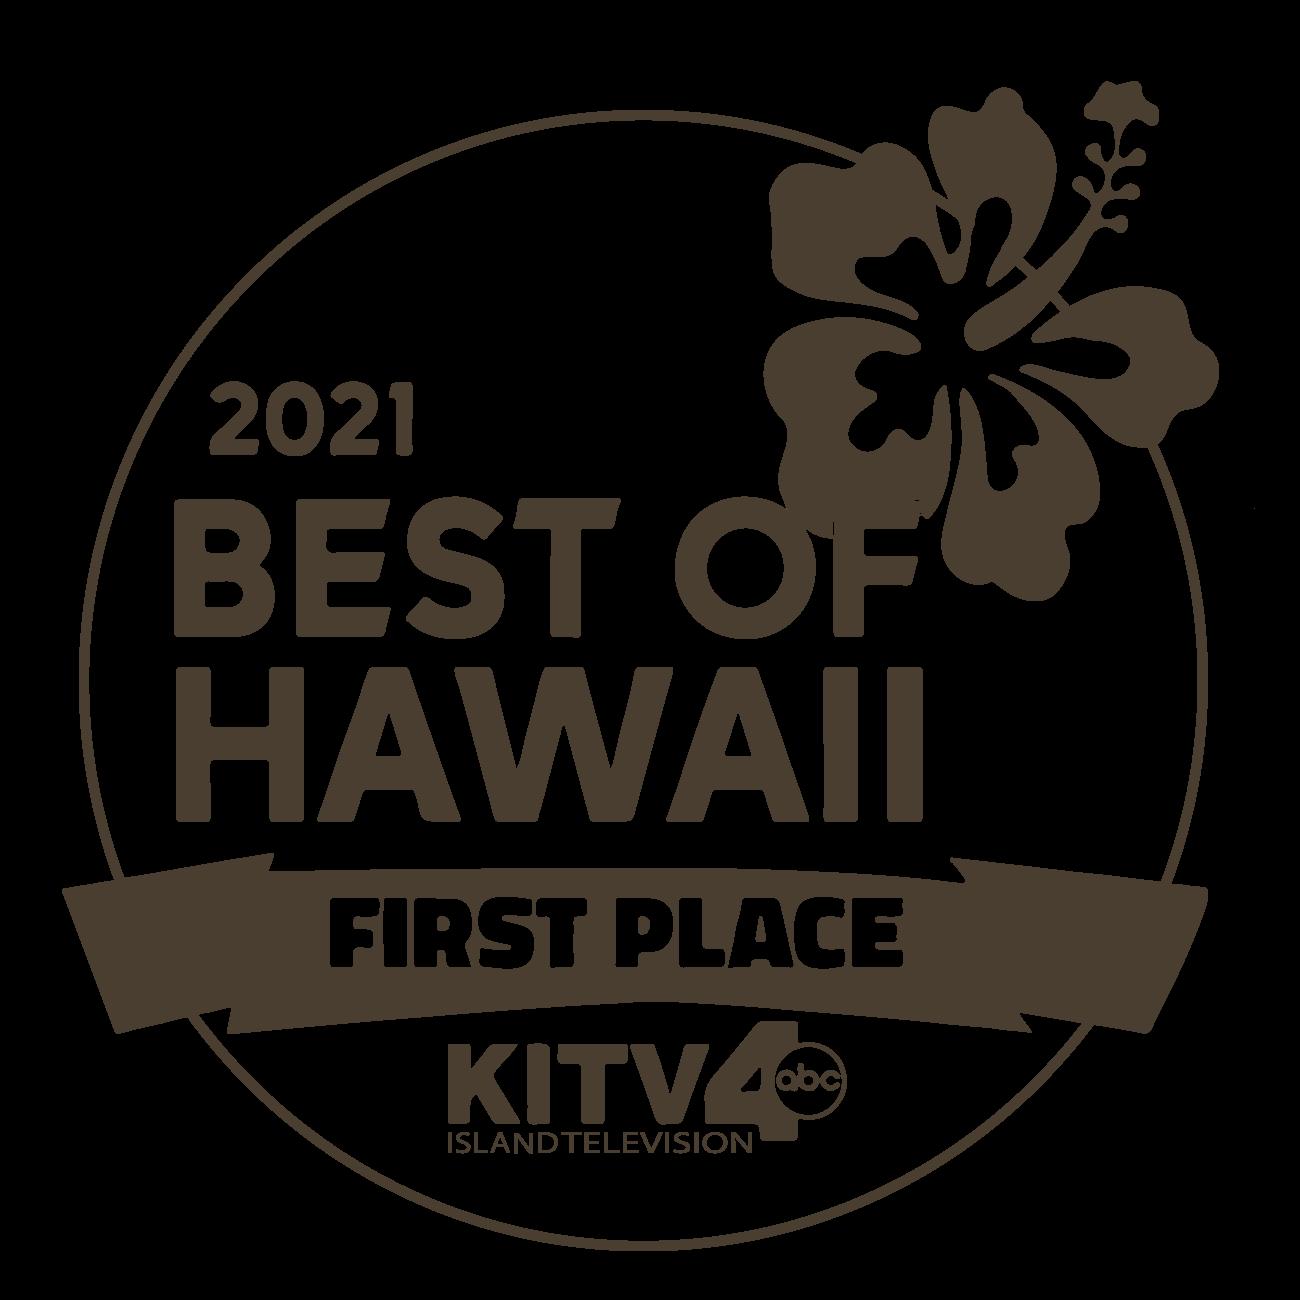 Best of Hawaii 1st place KITV4 ABC